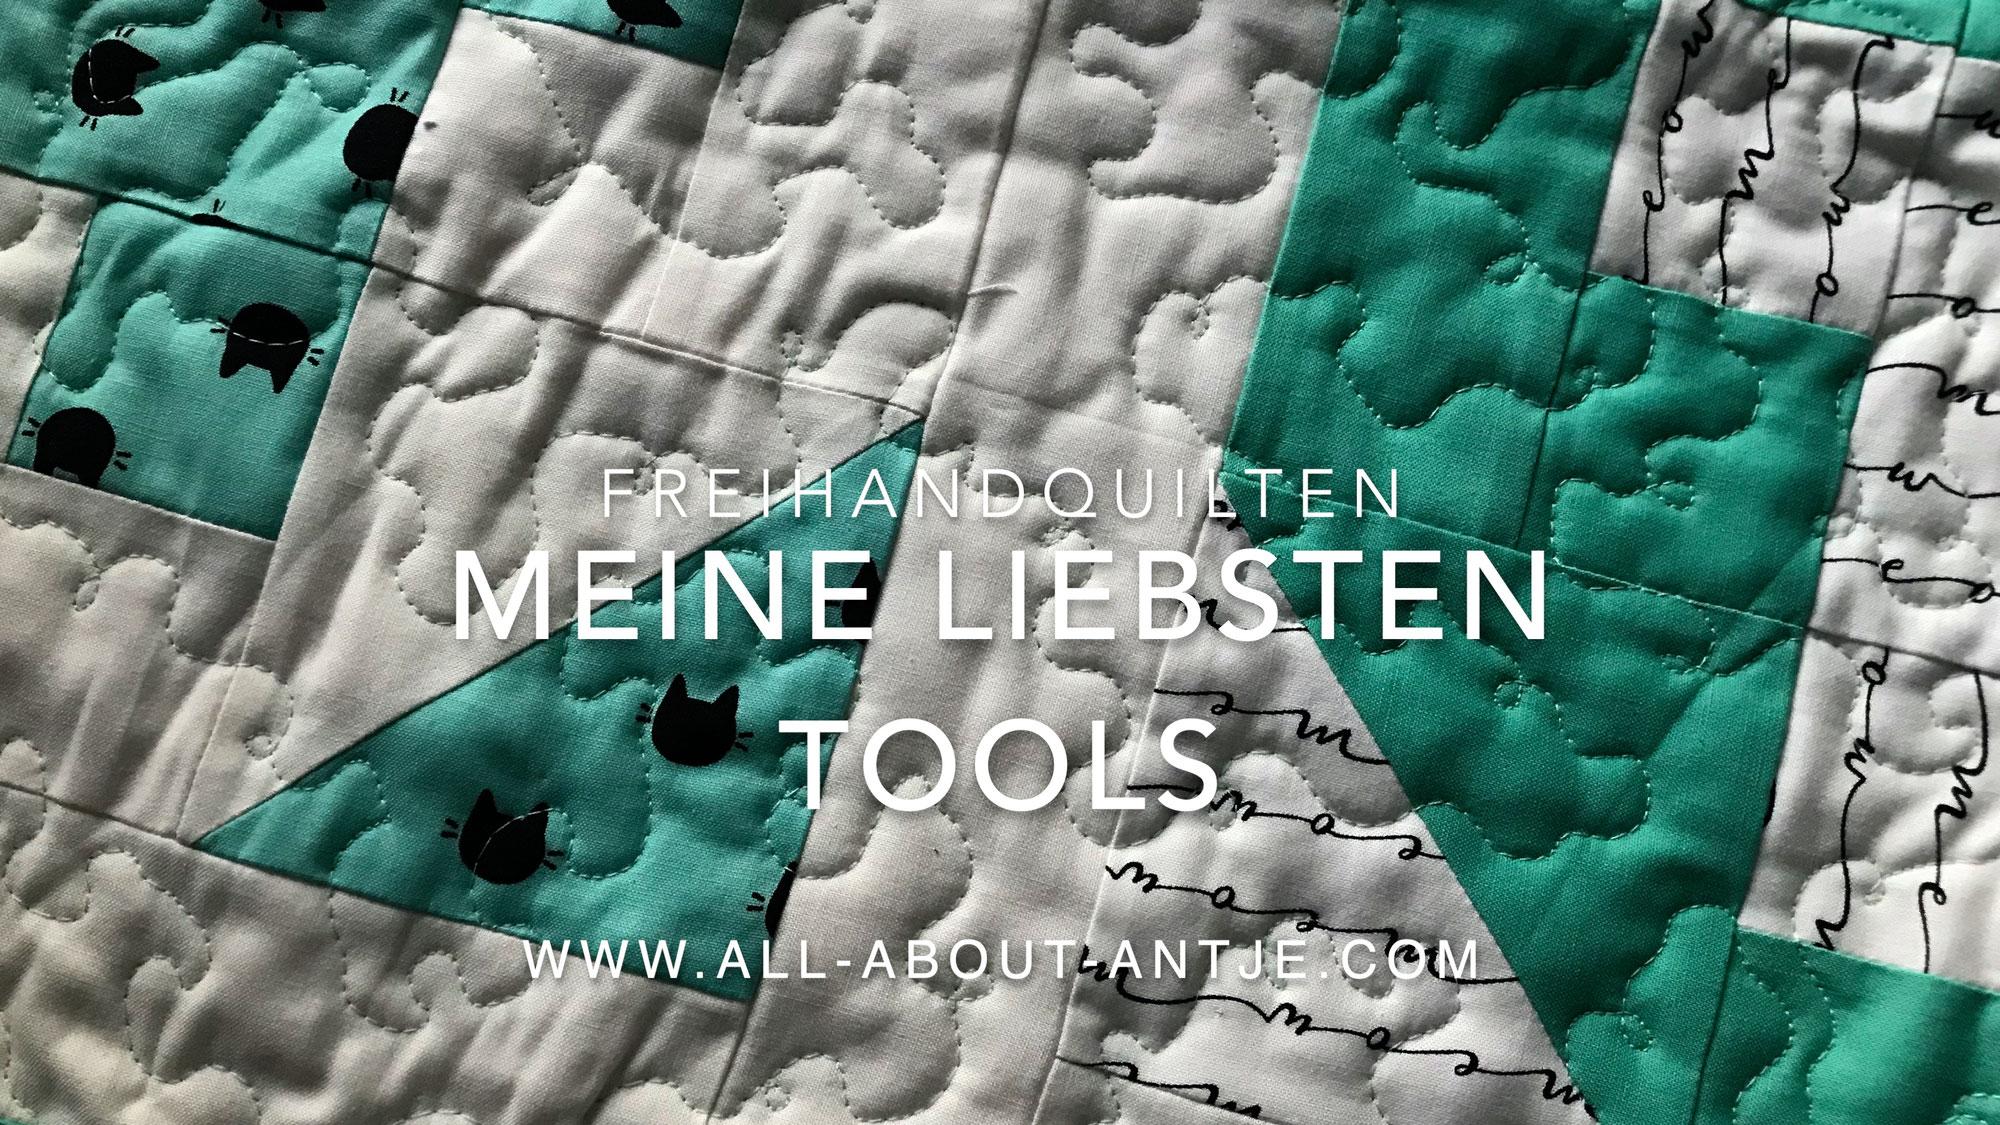 Freihandquilten Tools & Hilfsmittel